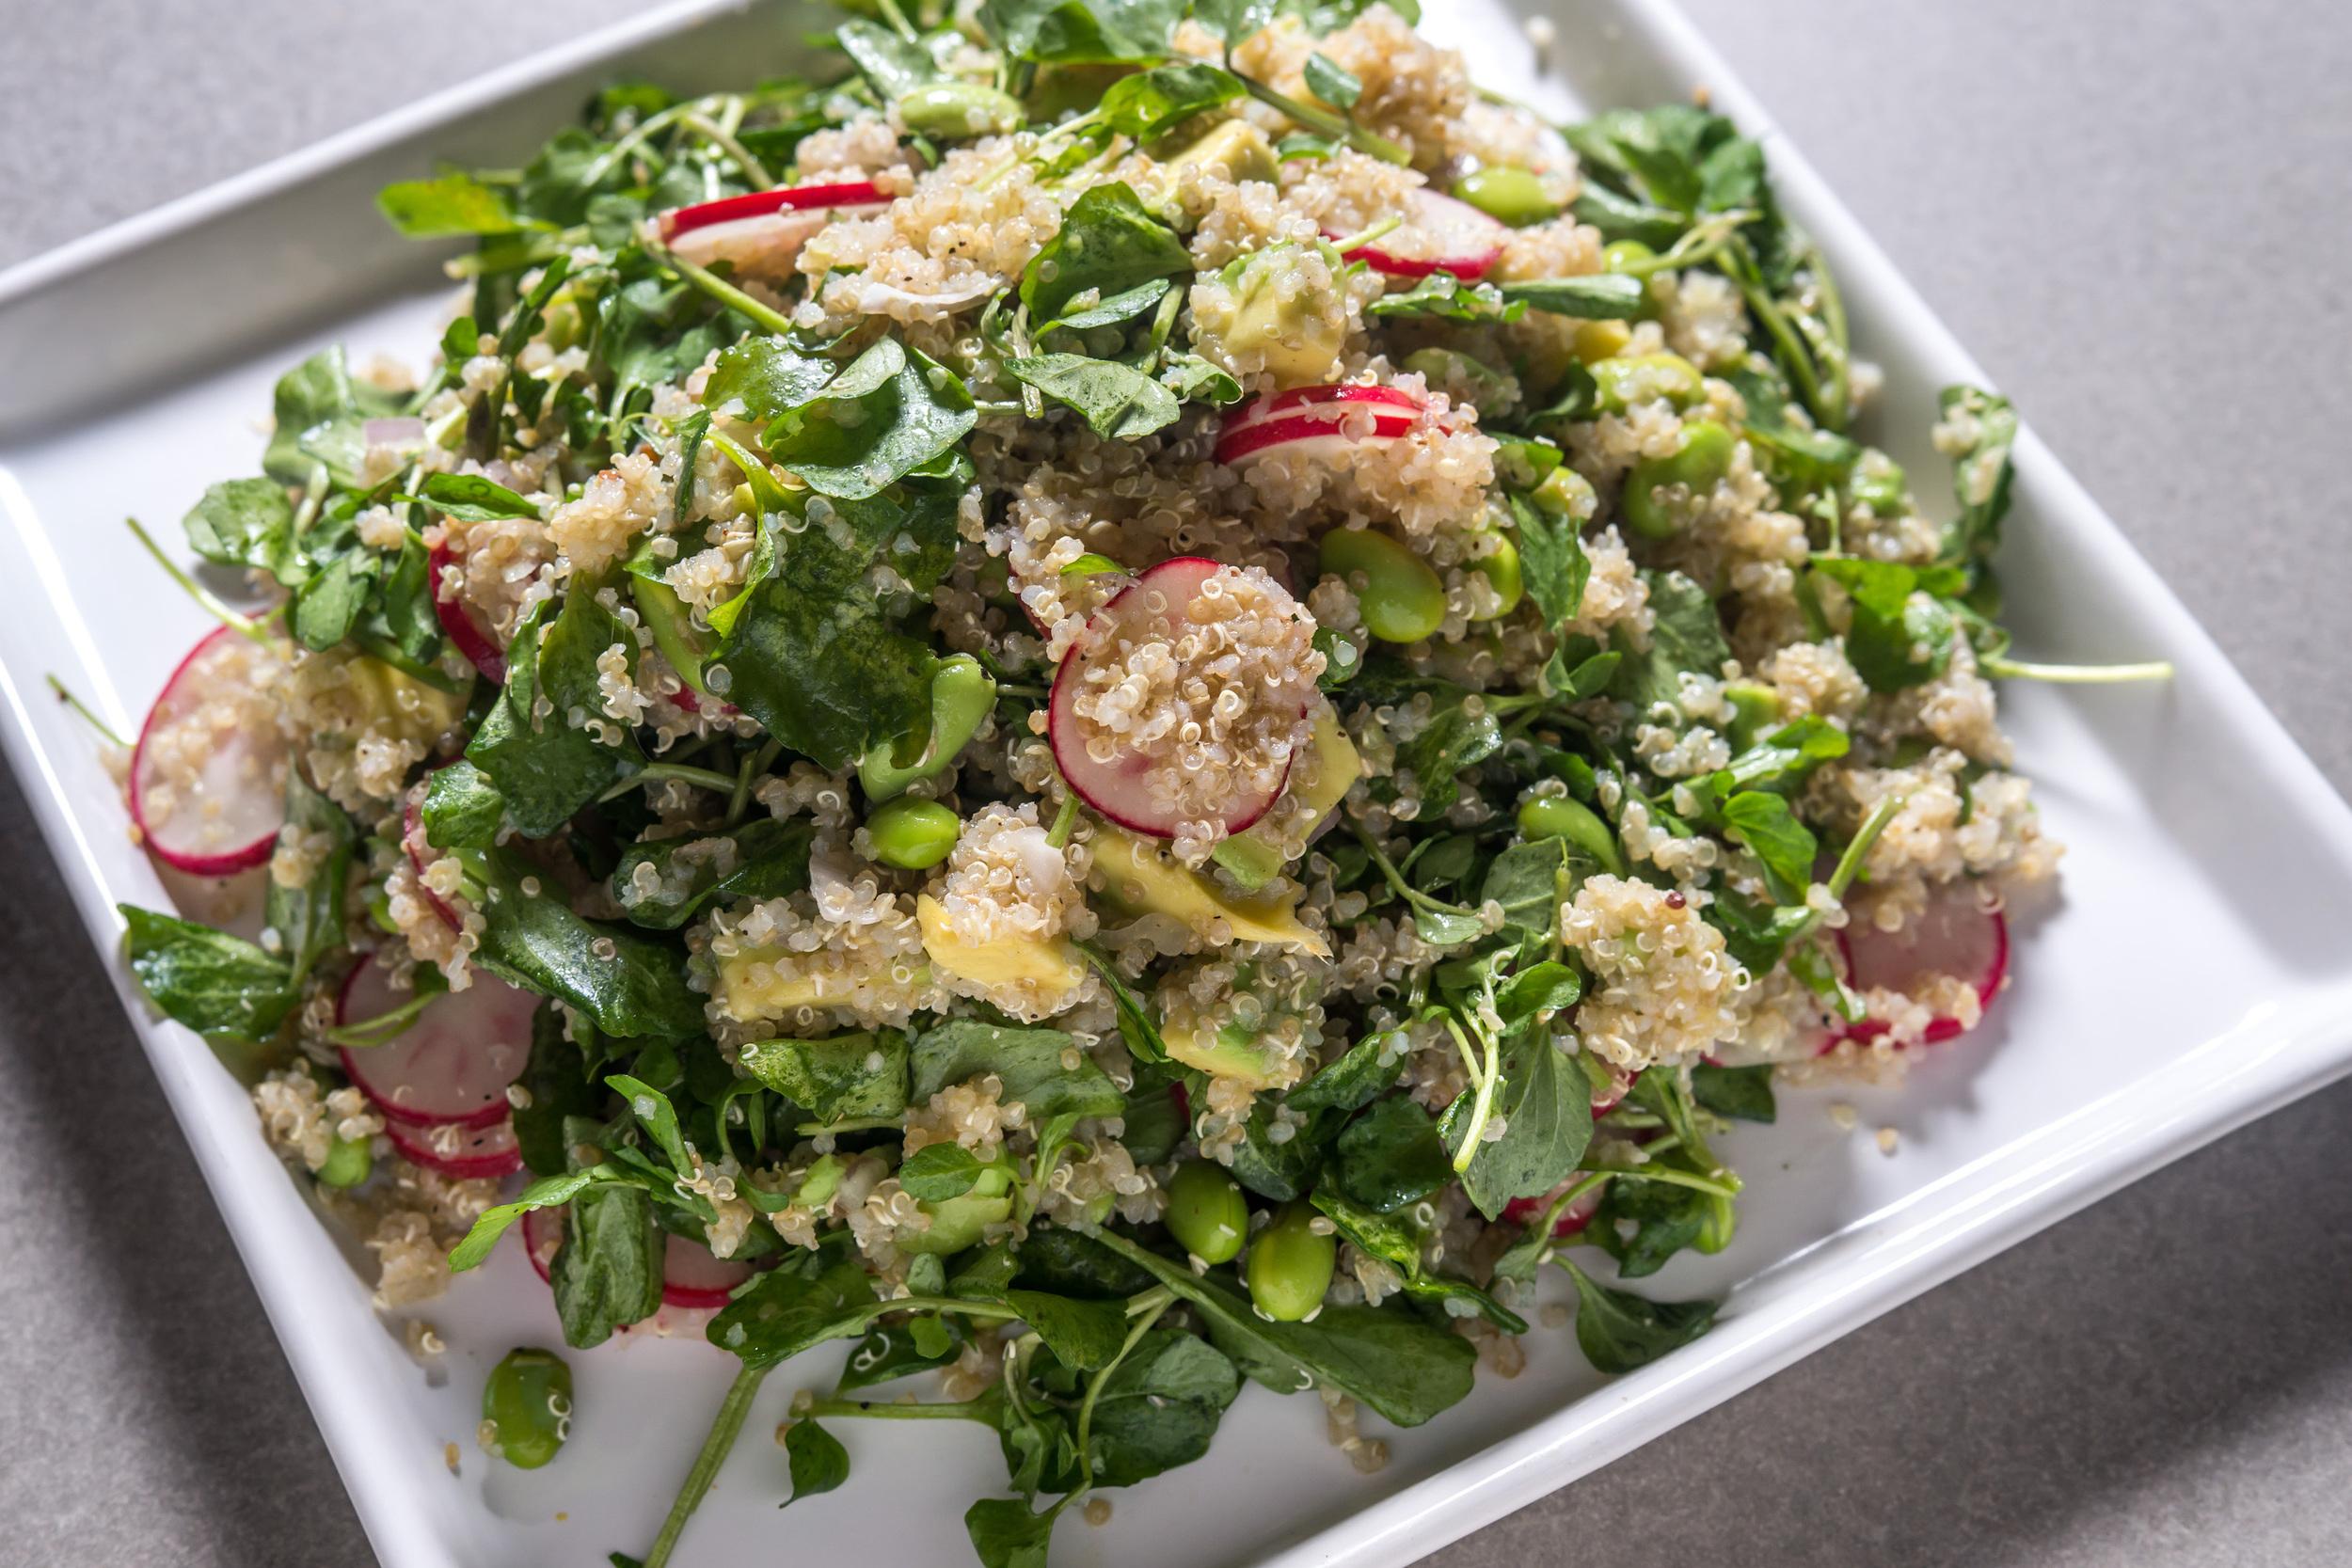 Quinoa salad with watercress, edamame and radishes